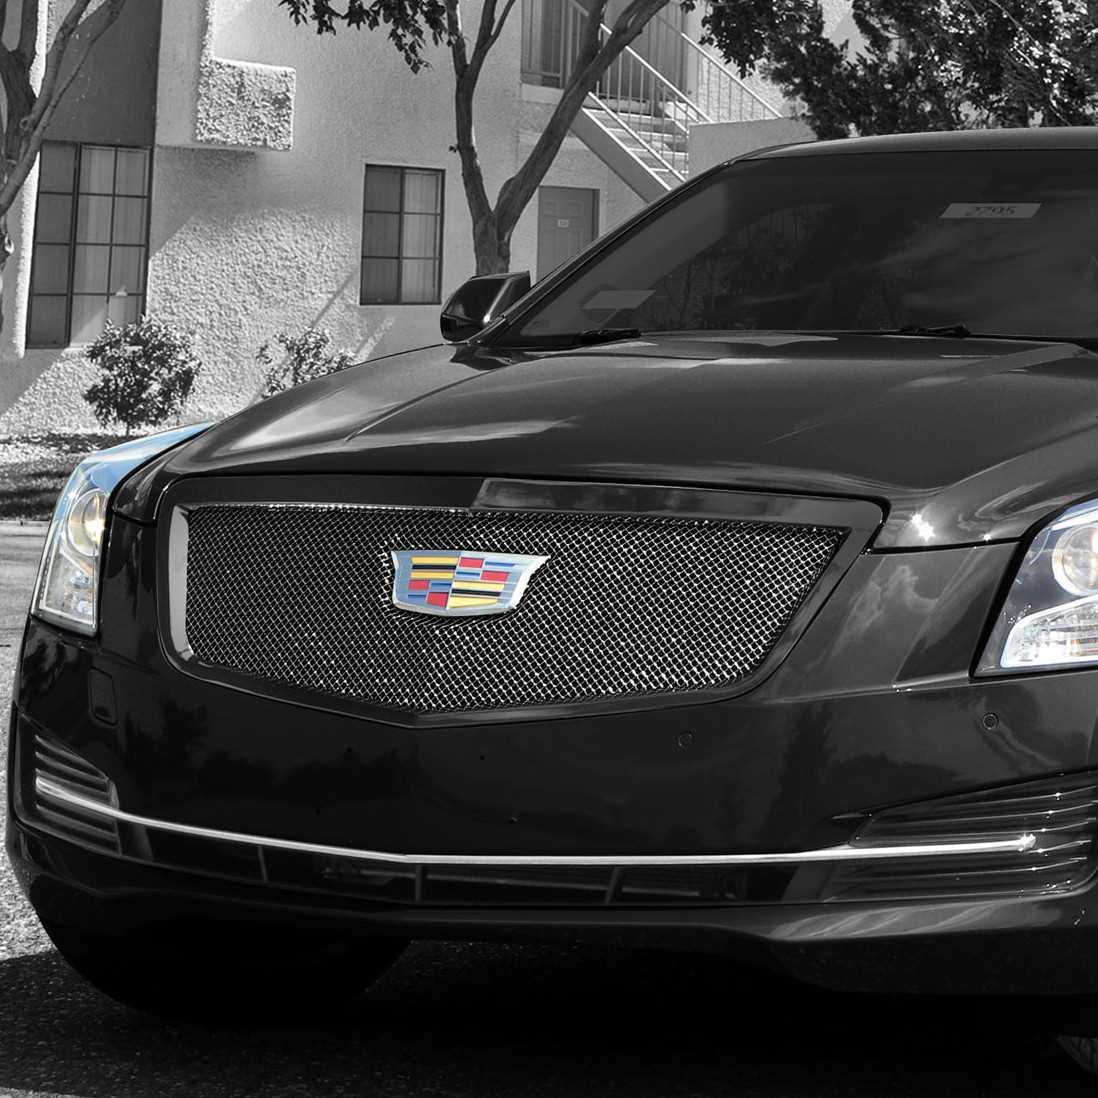 E&G Clics 2015-2016 Cadillac ATS Grille Clic Black Ice Fine ...